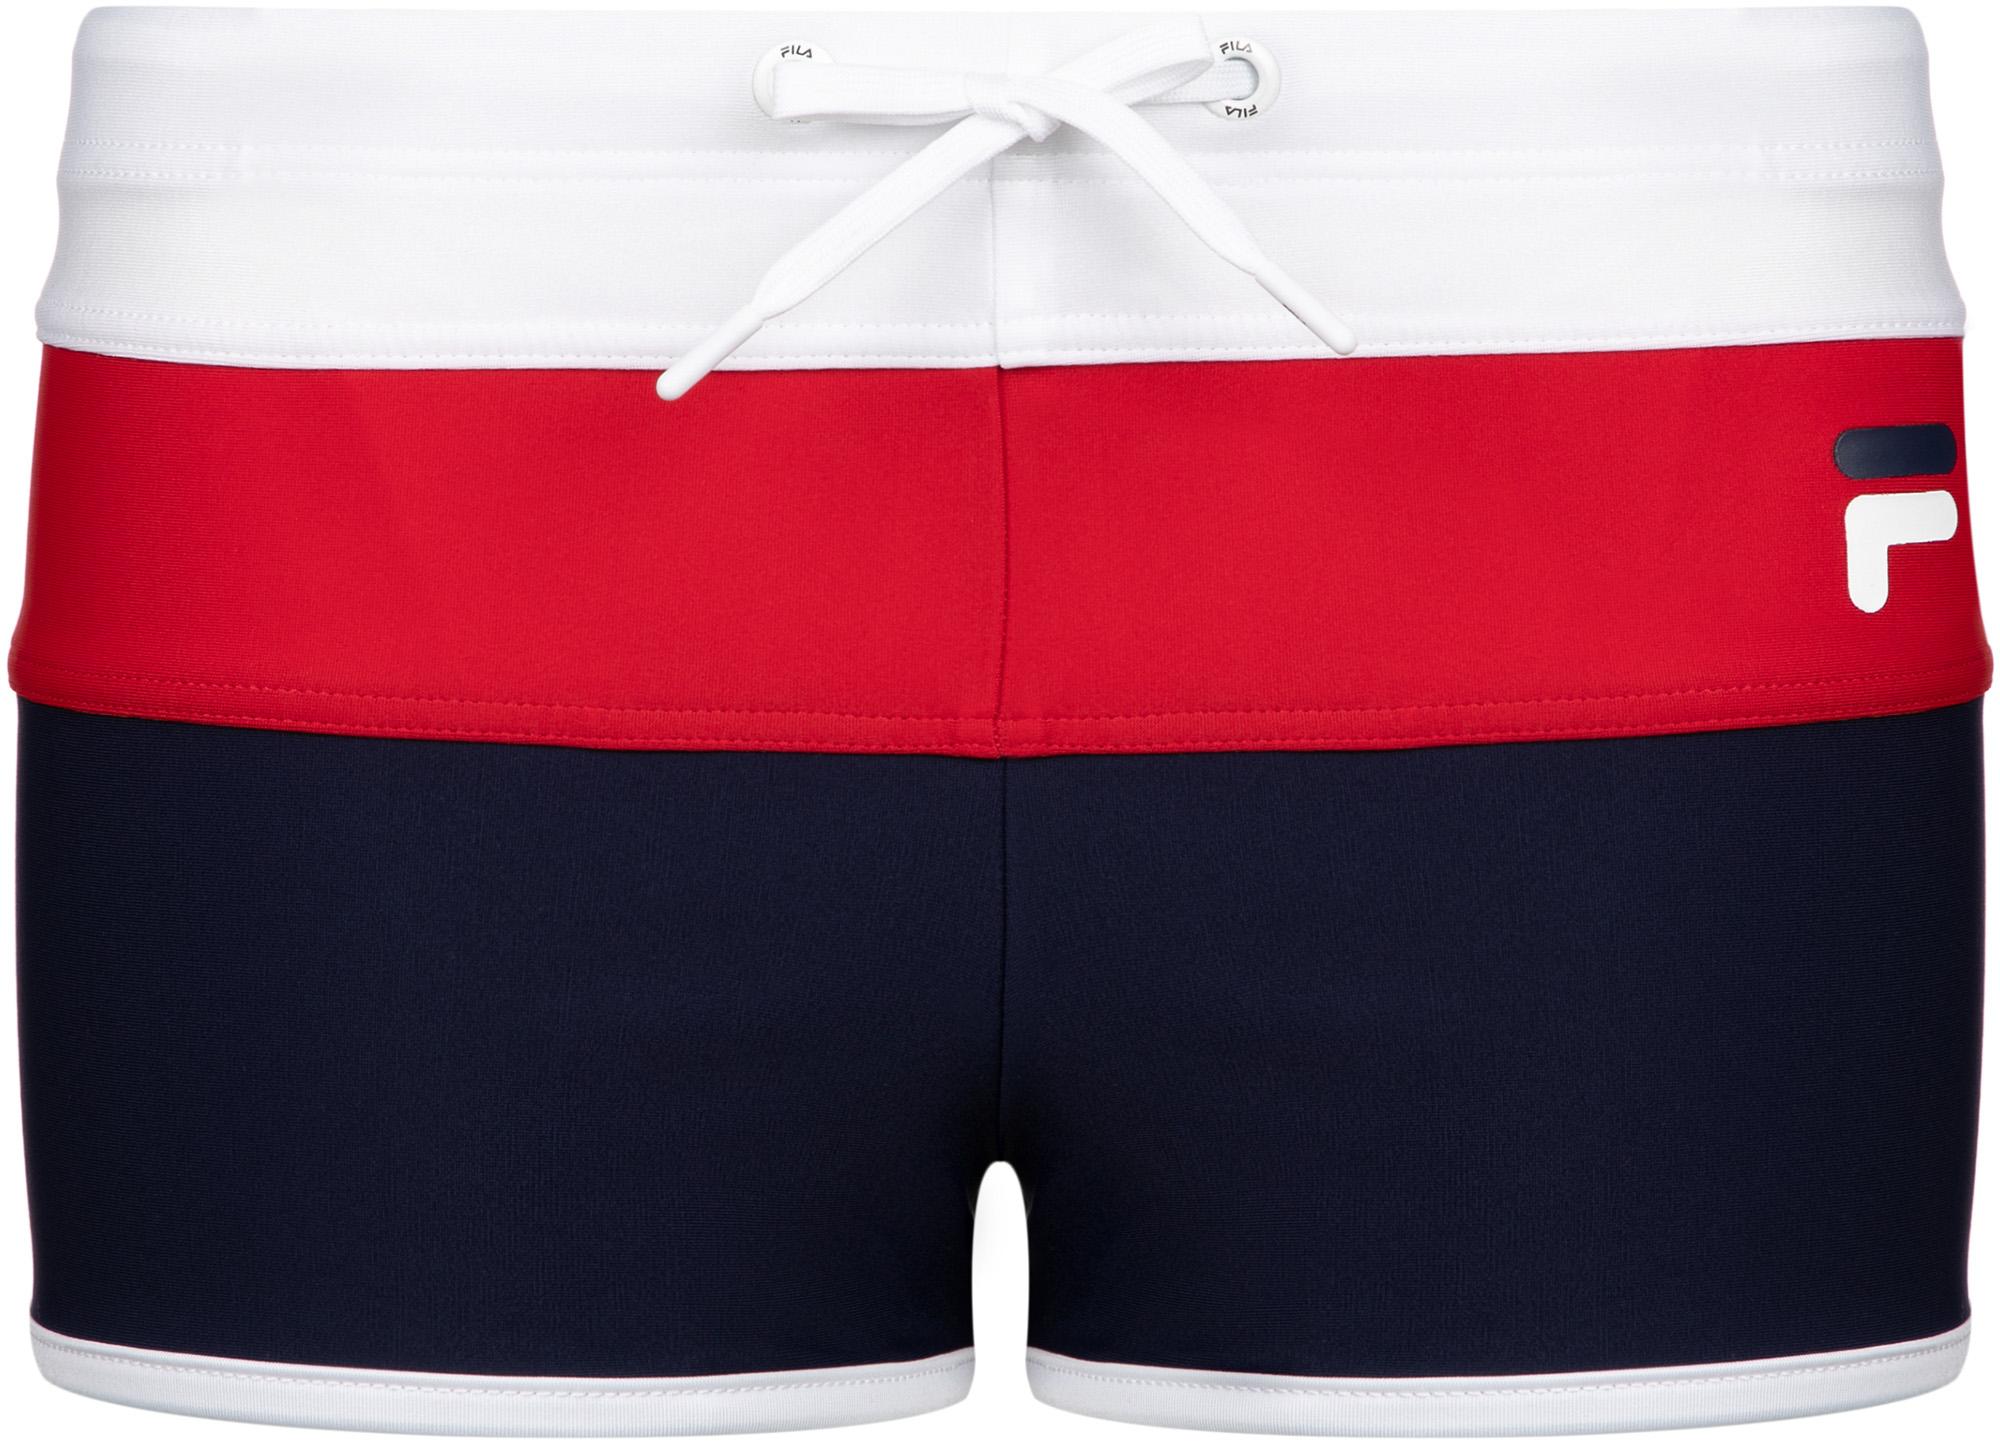 fila плавки для мальчиков fila размер 128 Fila Плавки-шорты для мальчиков Fila, размер 140